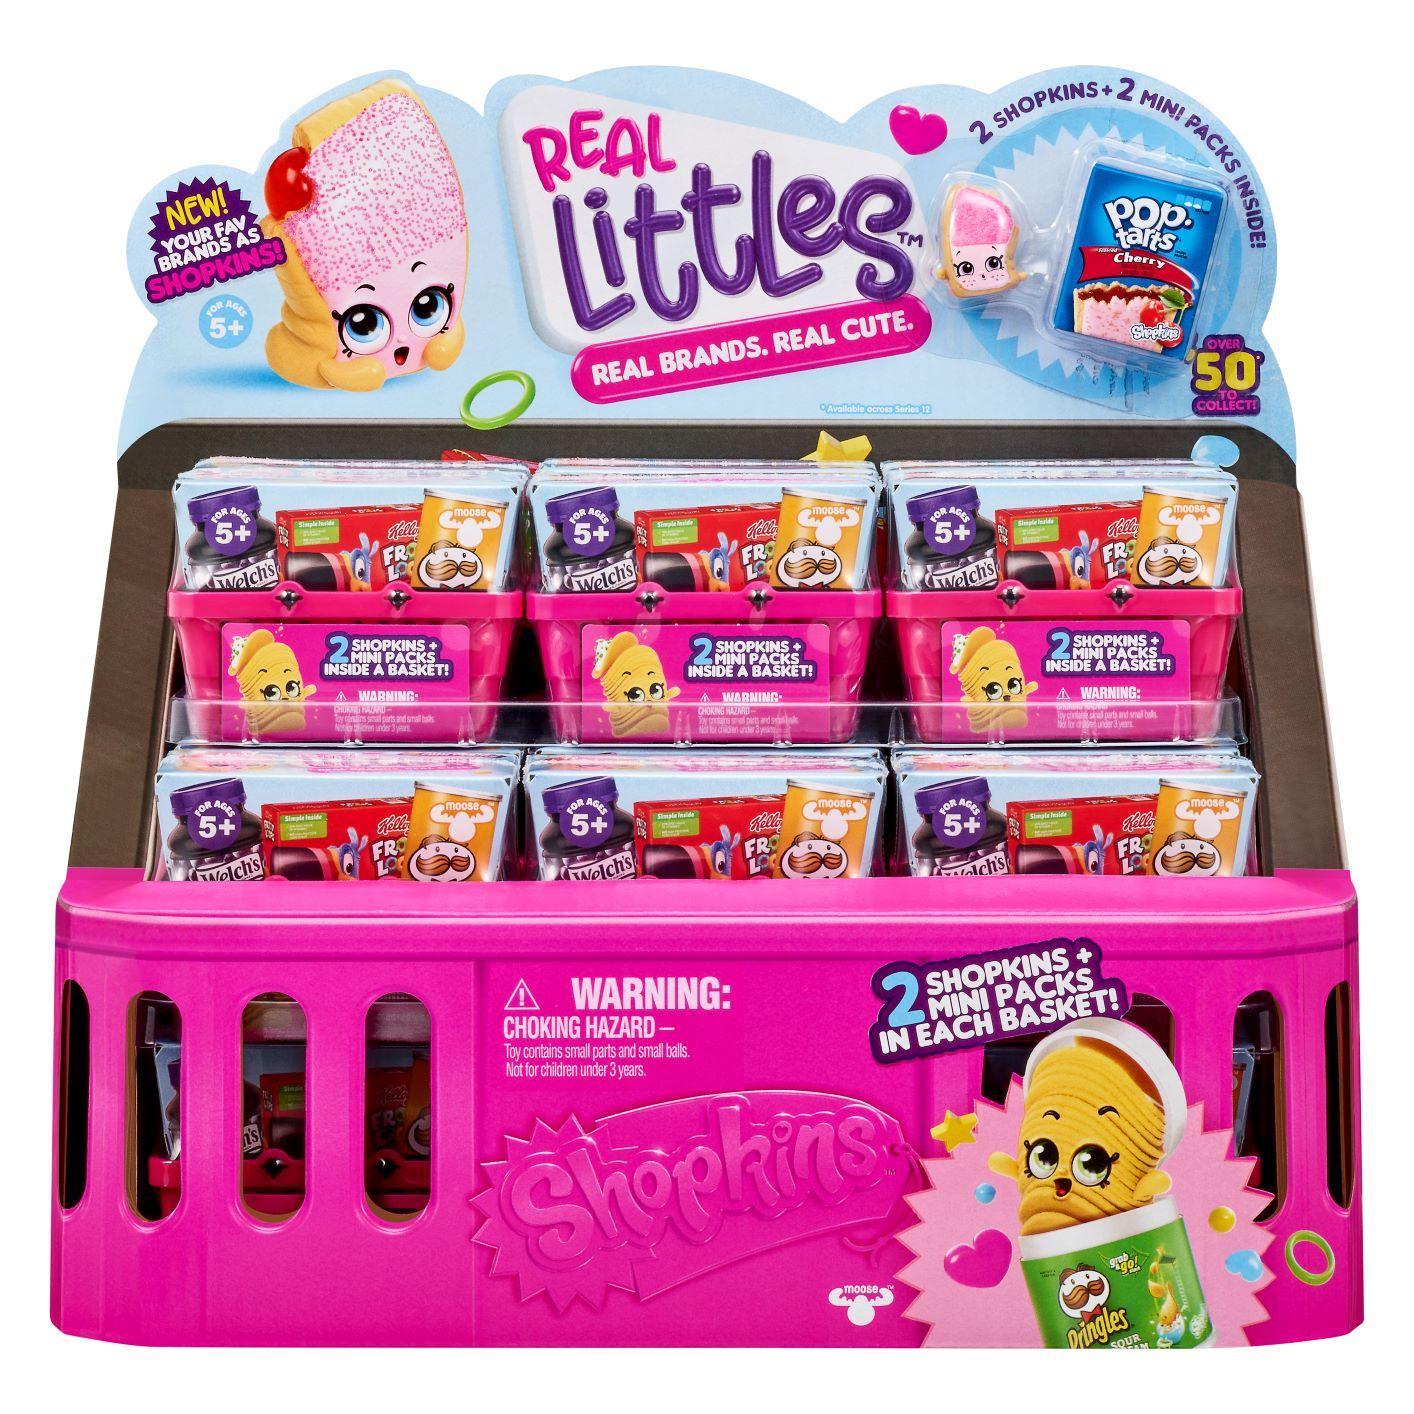 Real Littles Mini Pack Moose Toys